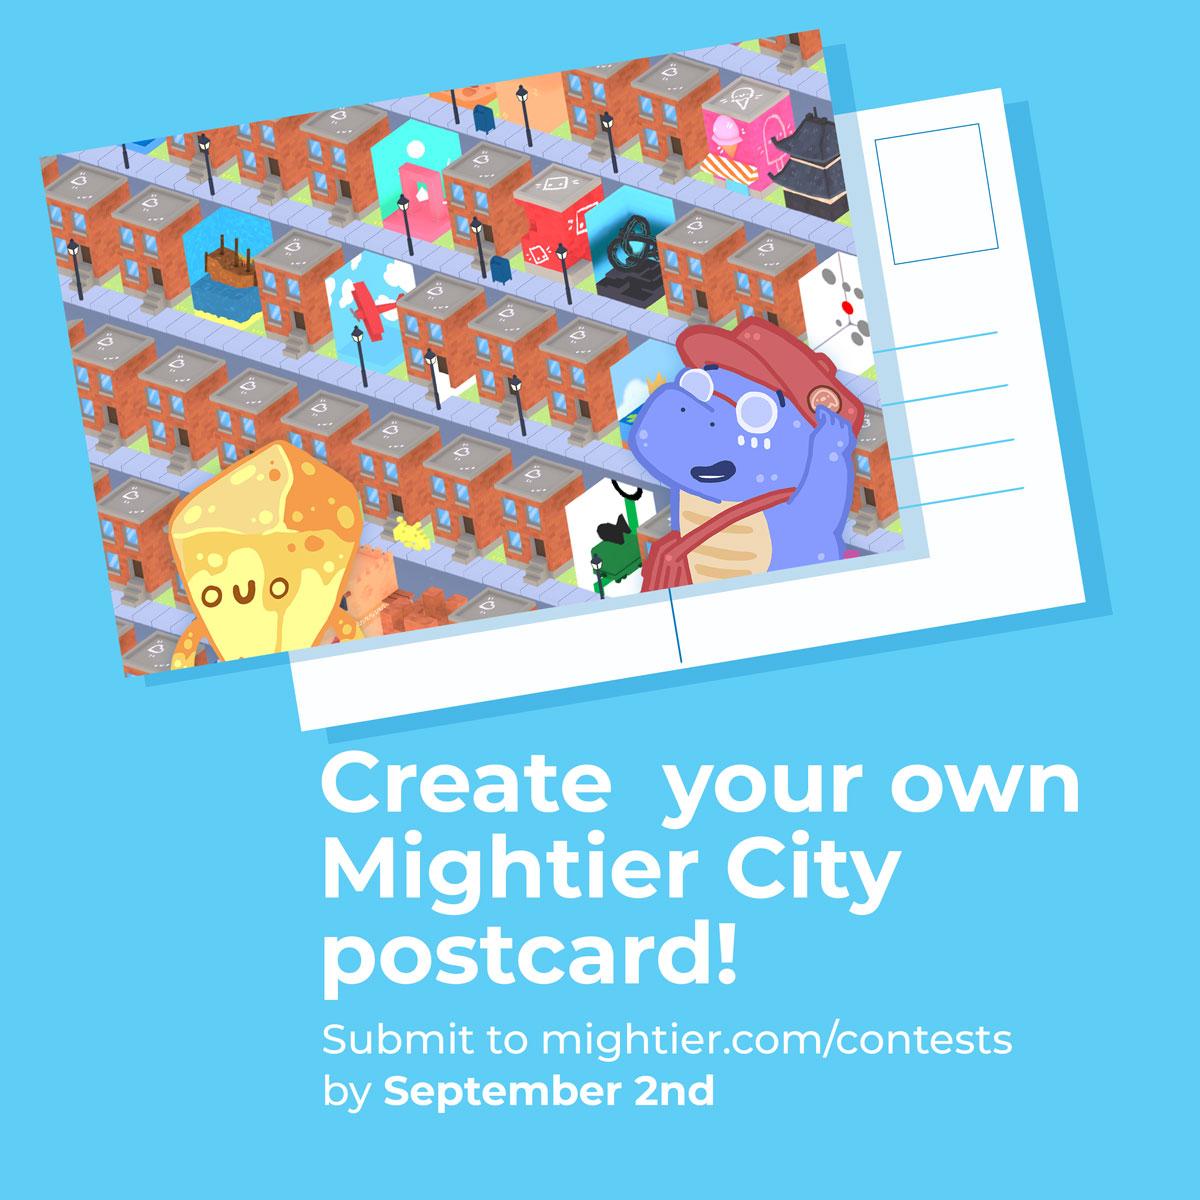 MightierCityPostcard (2).jpg